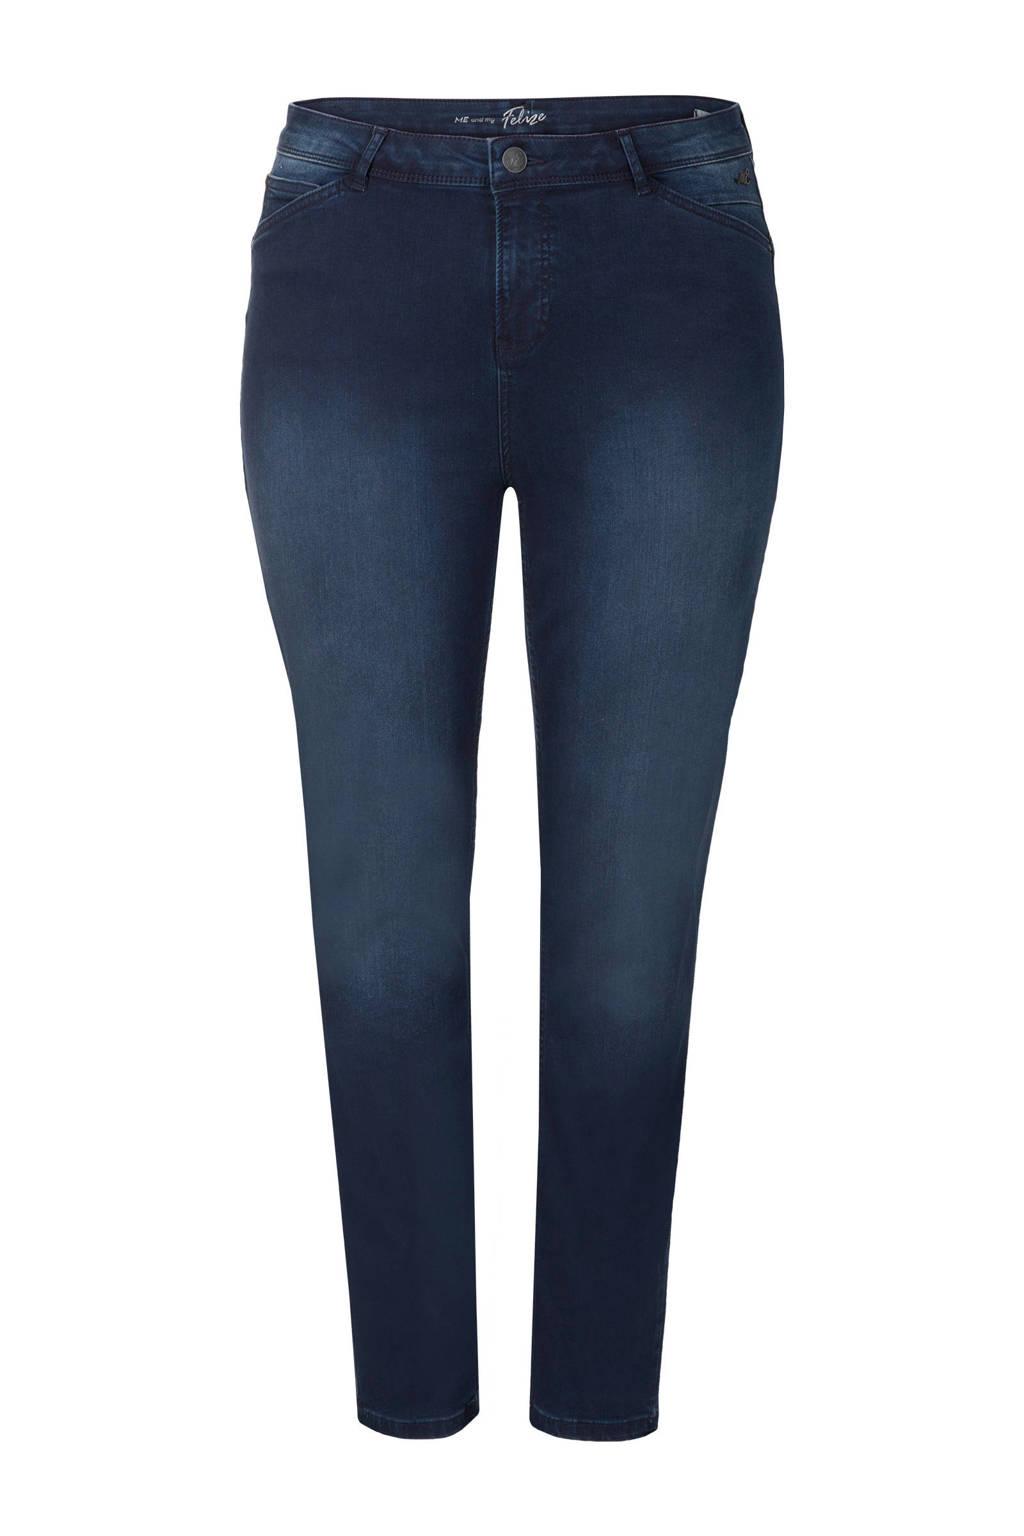 Miss Etam Plus skinny jeans 32 inch donkerblauw, Donkerblauw